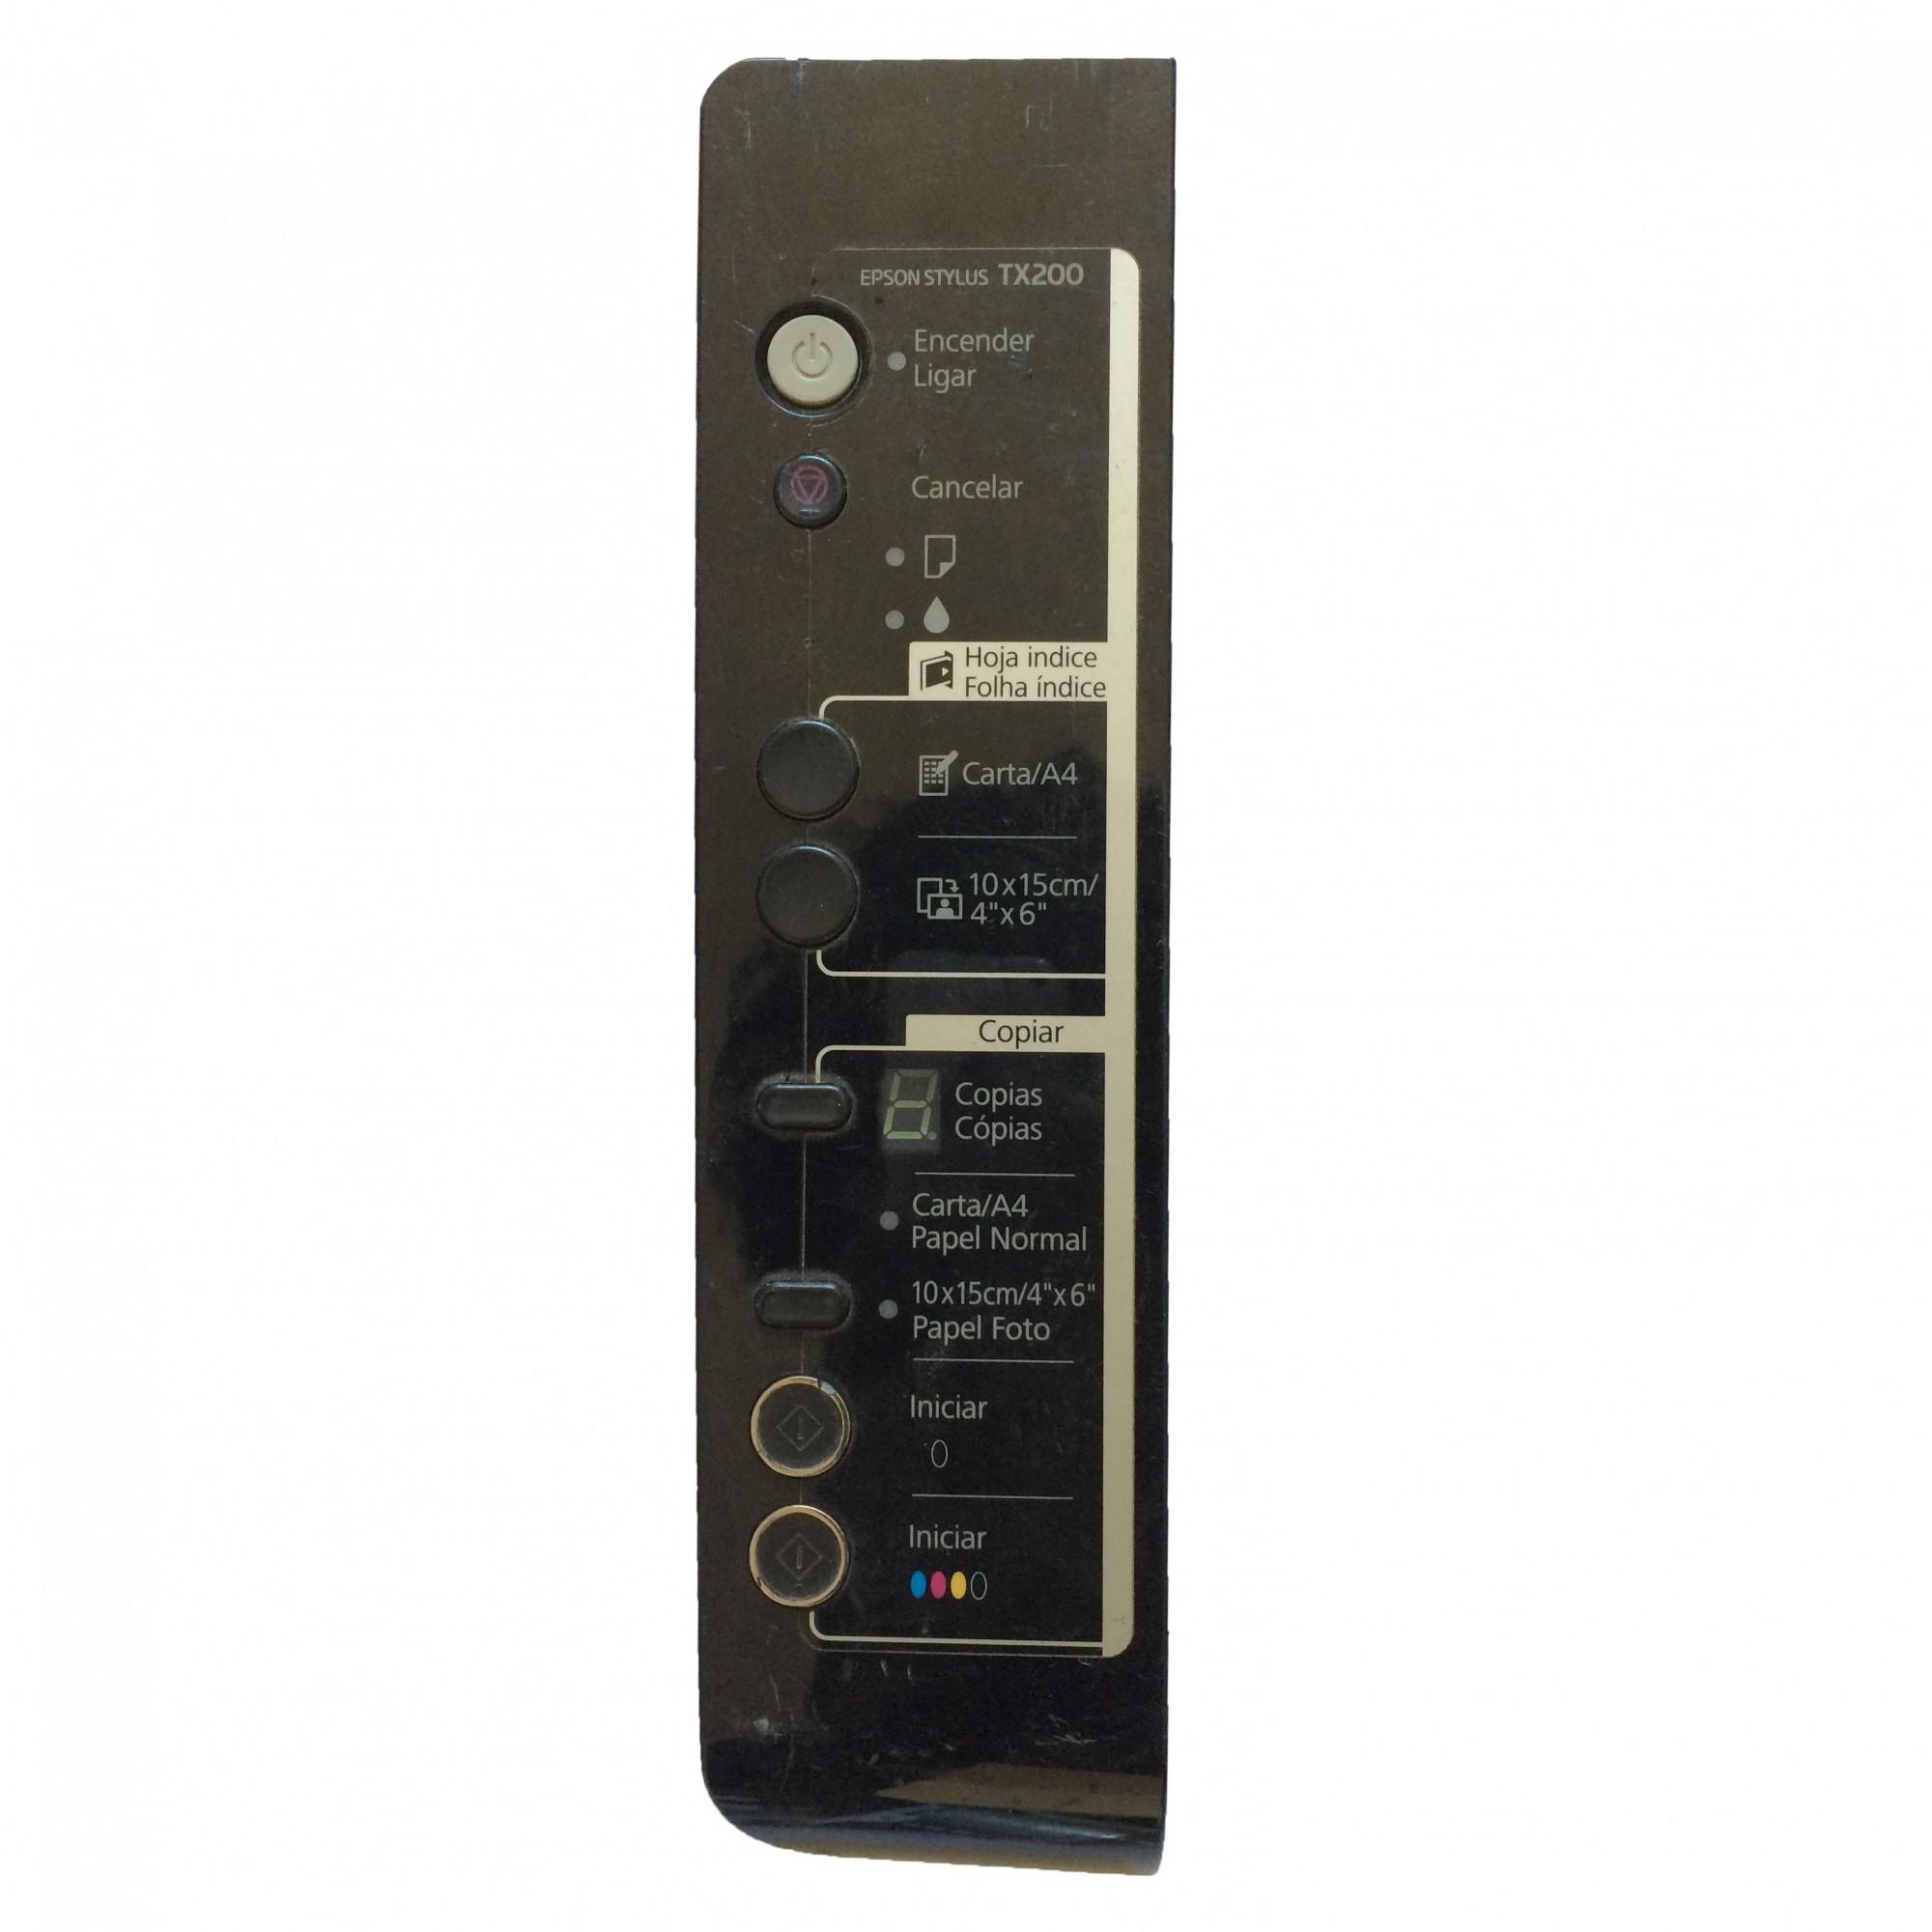 Painel Frontal Completo + Placa Multifuncional Epson Stylus TX200 - Retirado